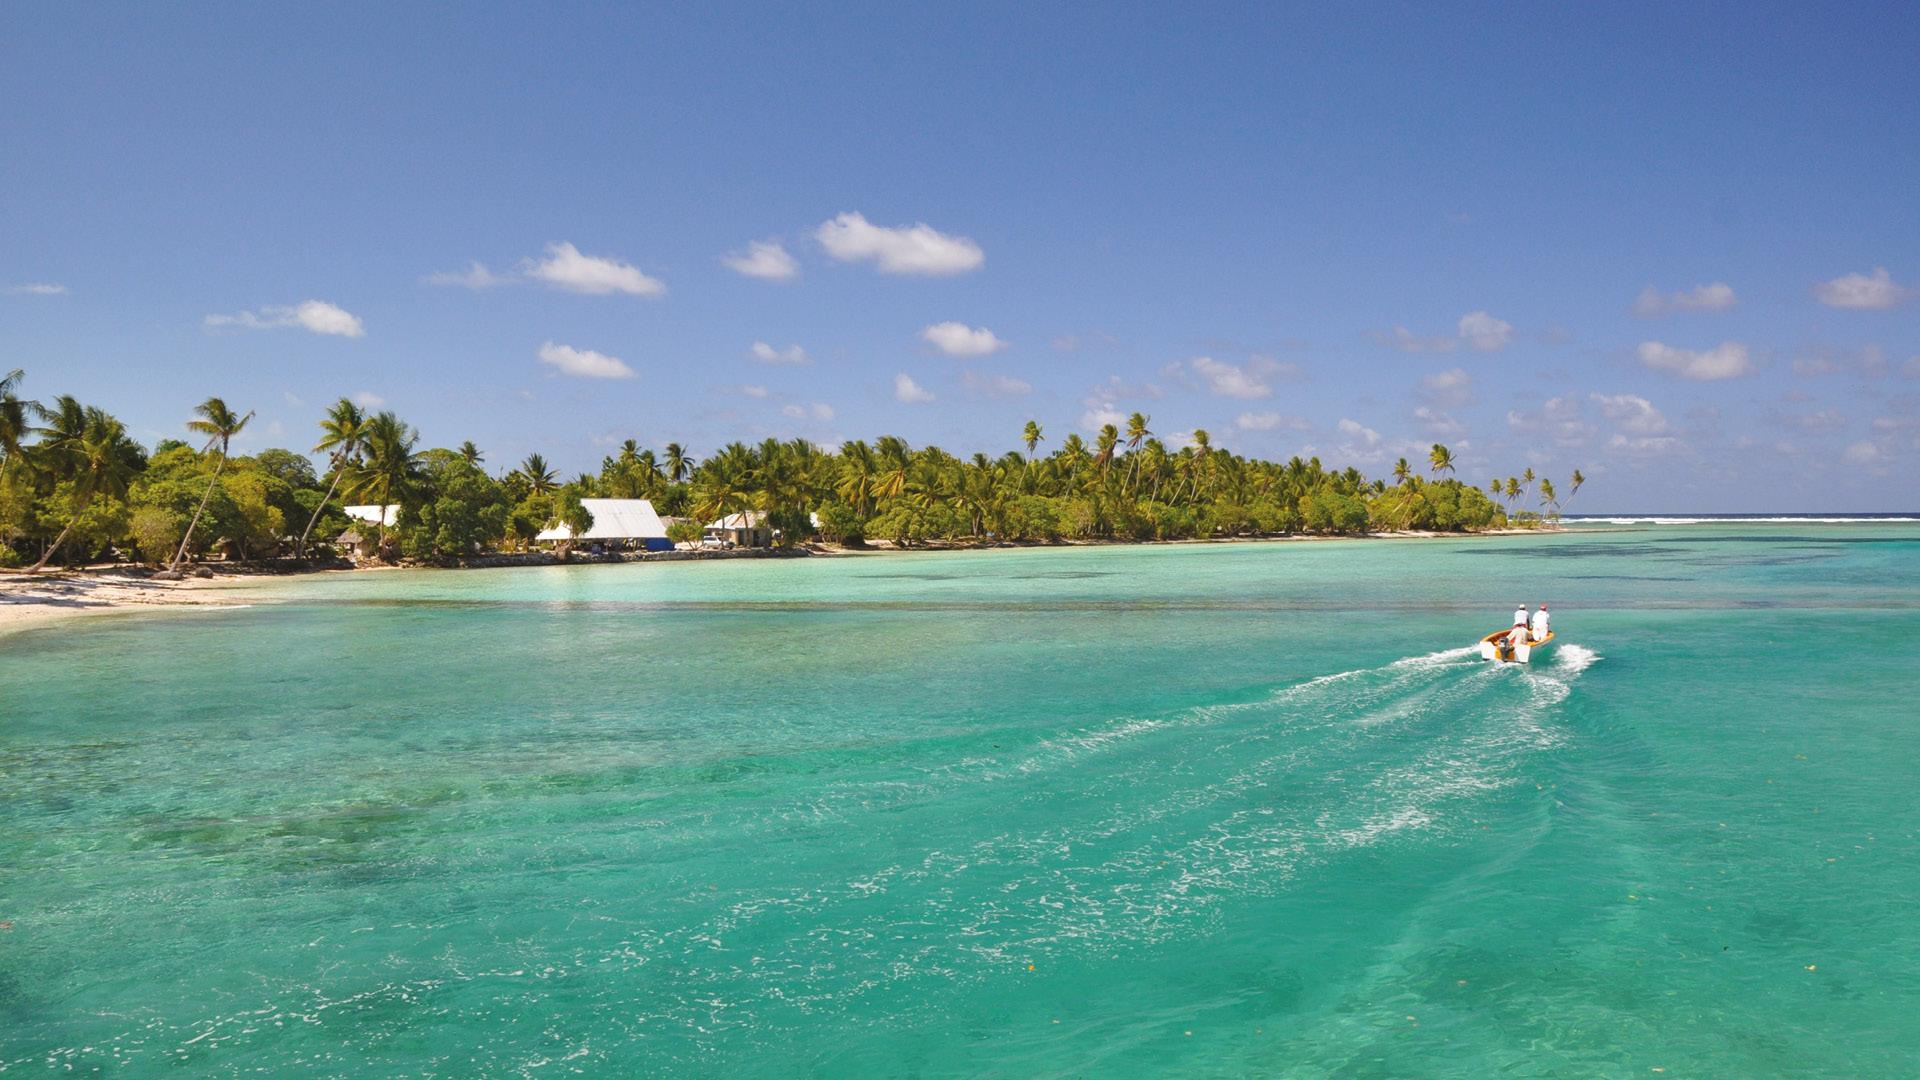 Sanitation solutions for island paradise